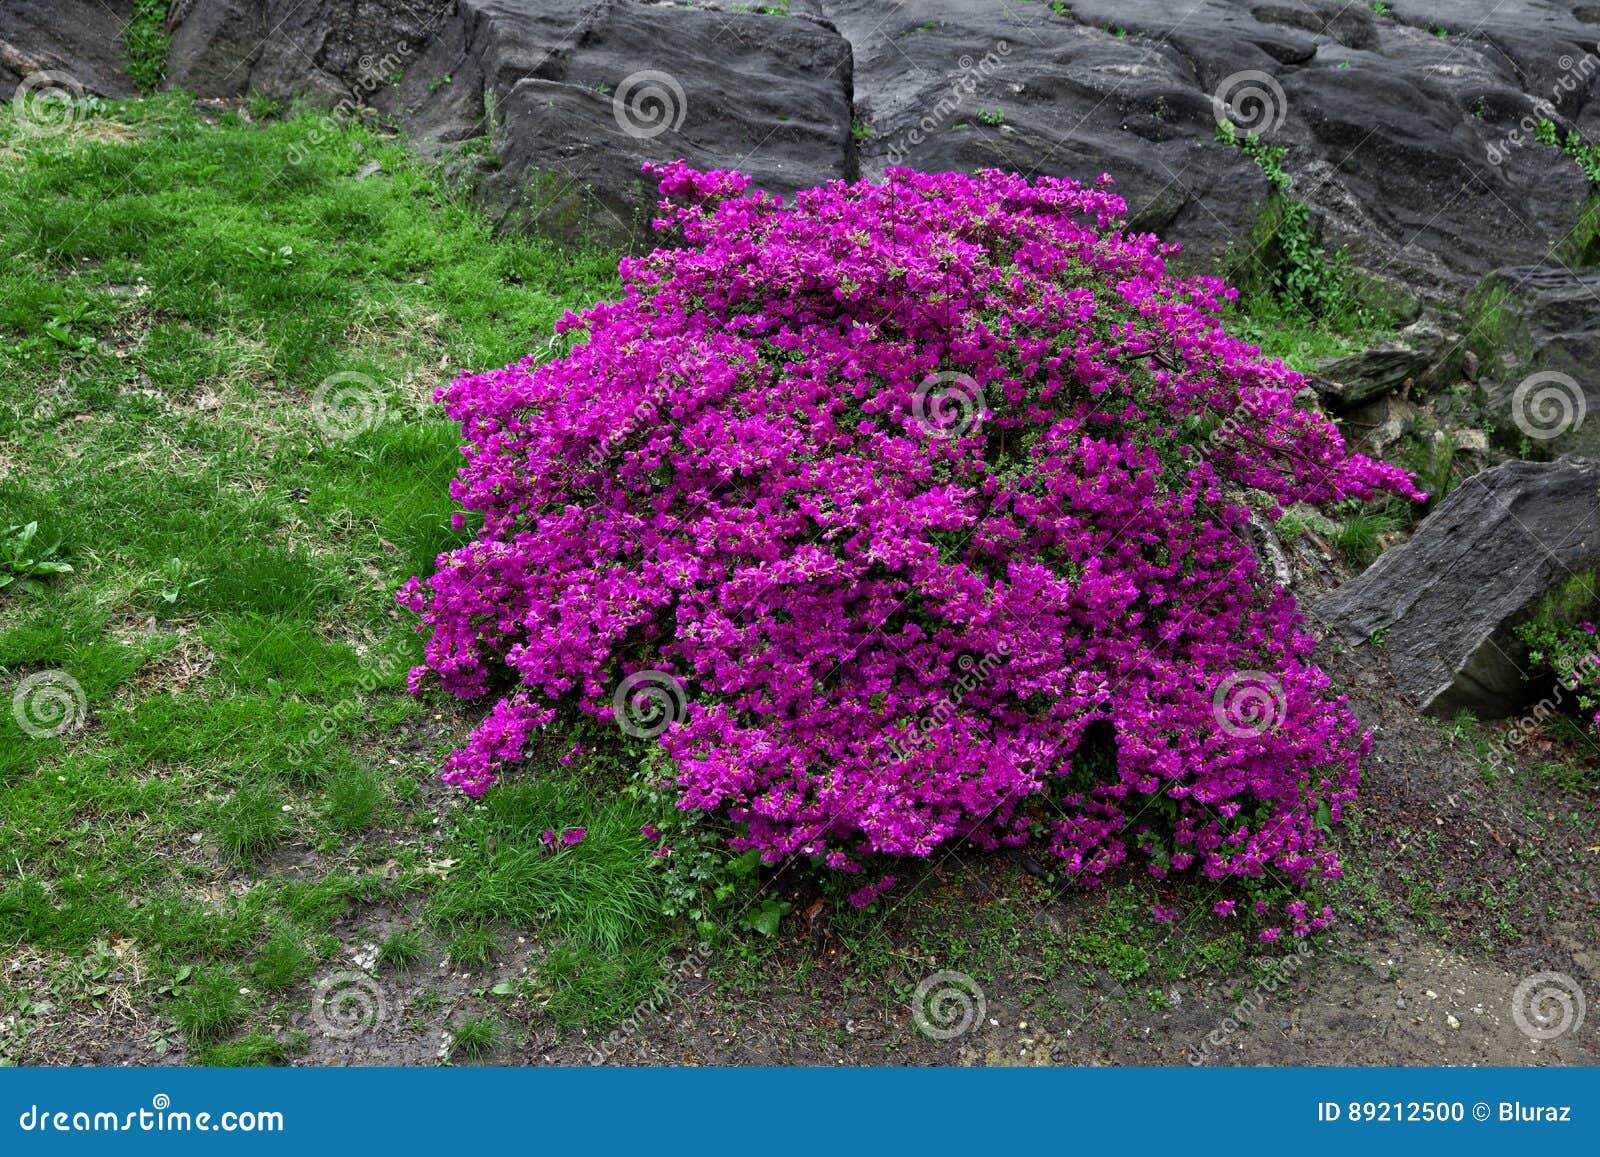 Bright Purple Flowering Bush Stock Photo Image Of Blossom Purple